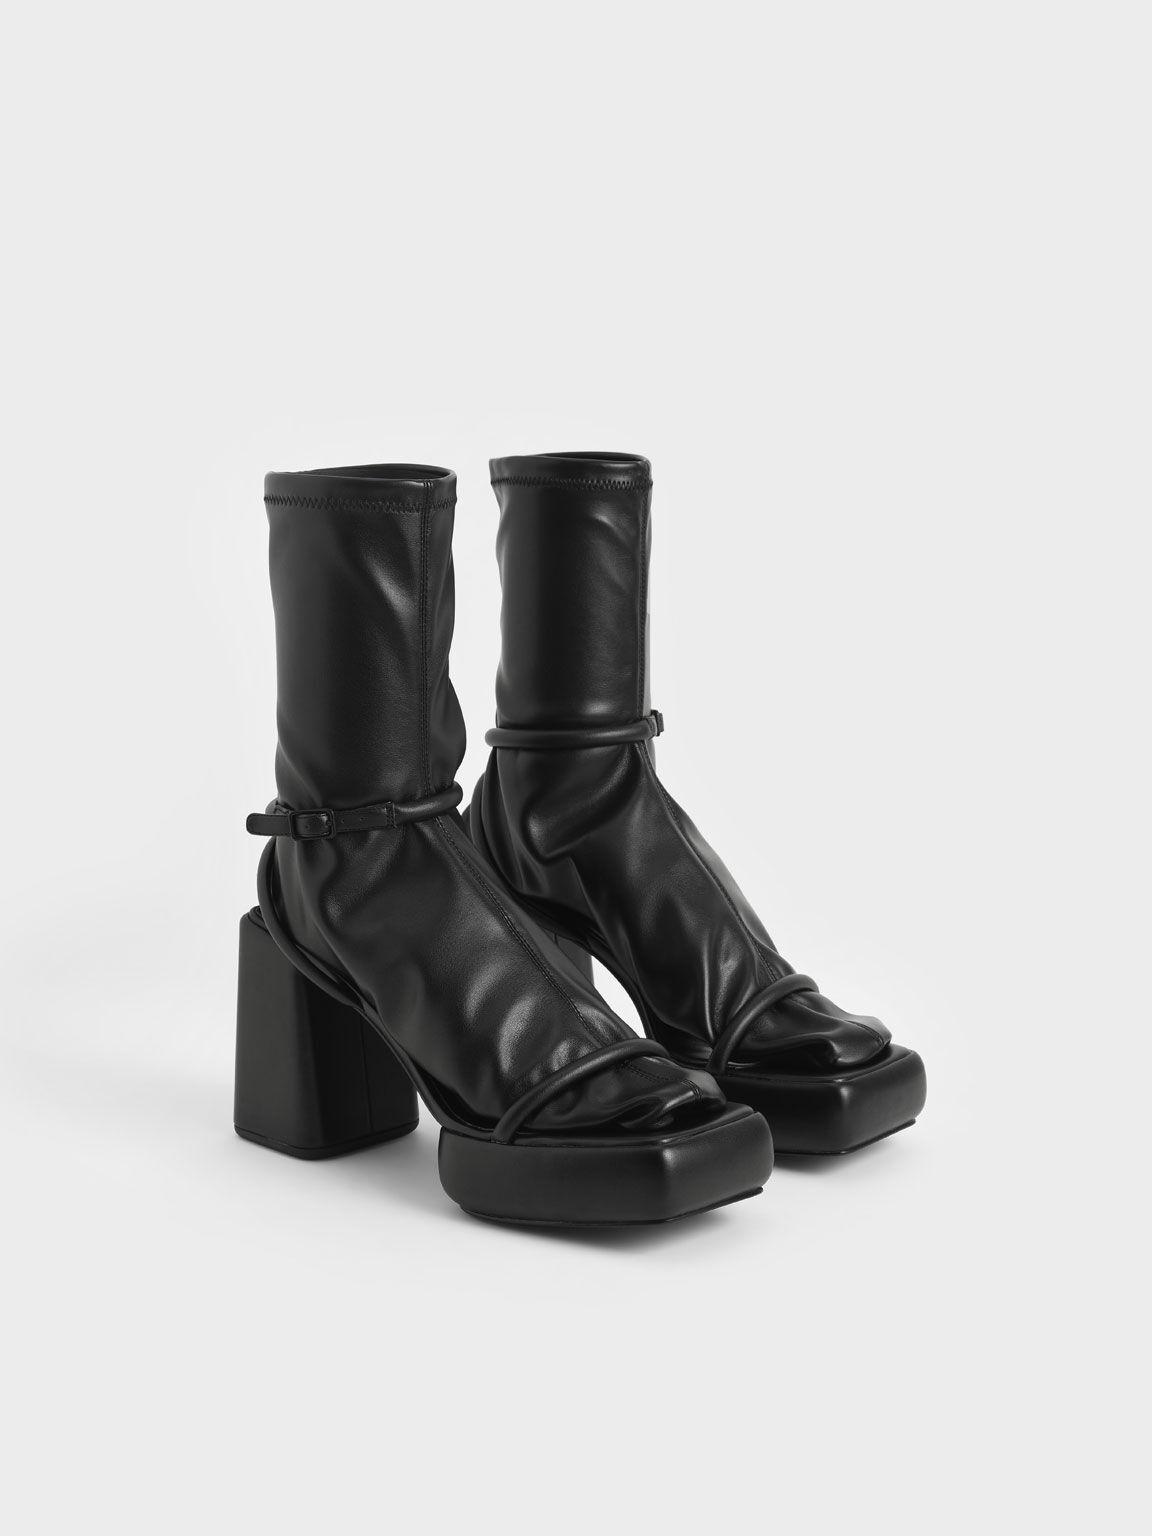 Lucile Platform Calf Boots, Black, hi-res